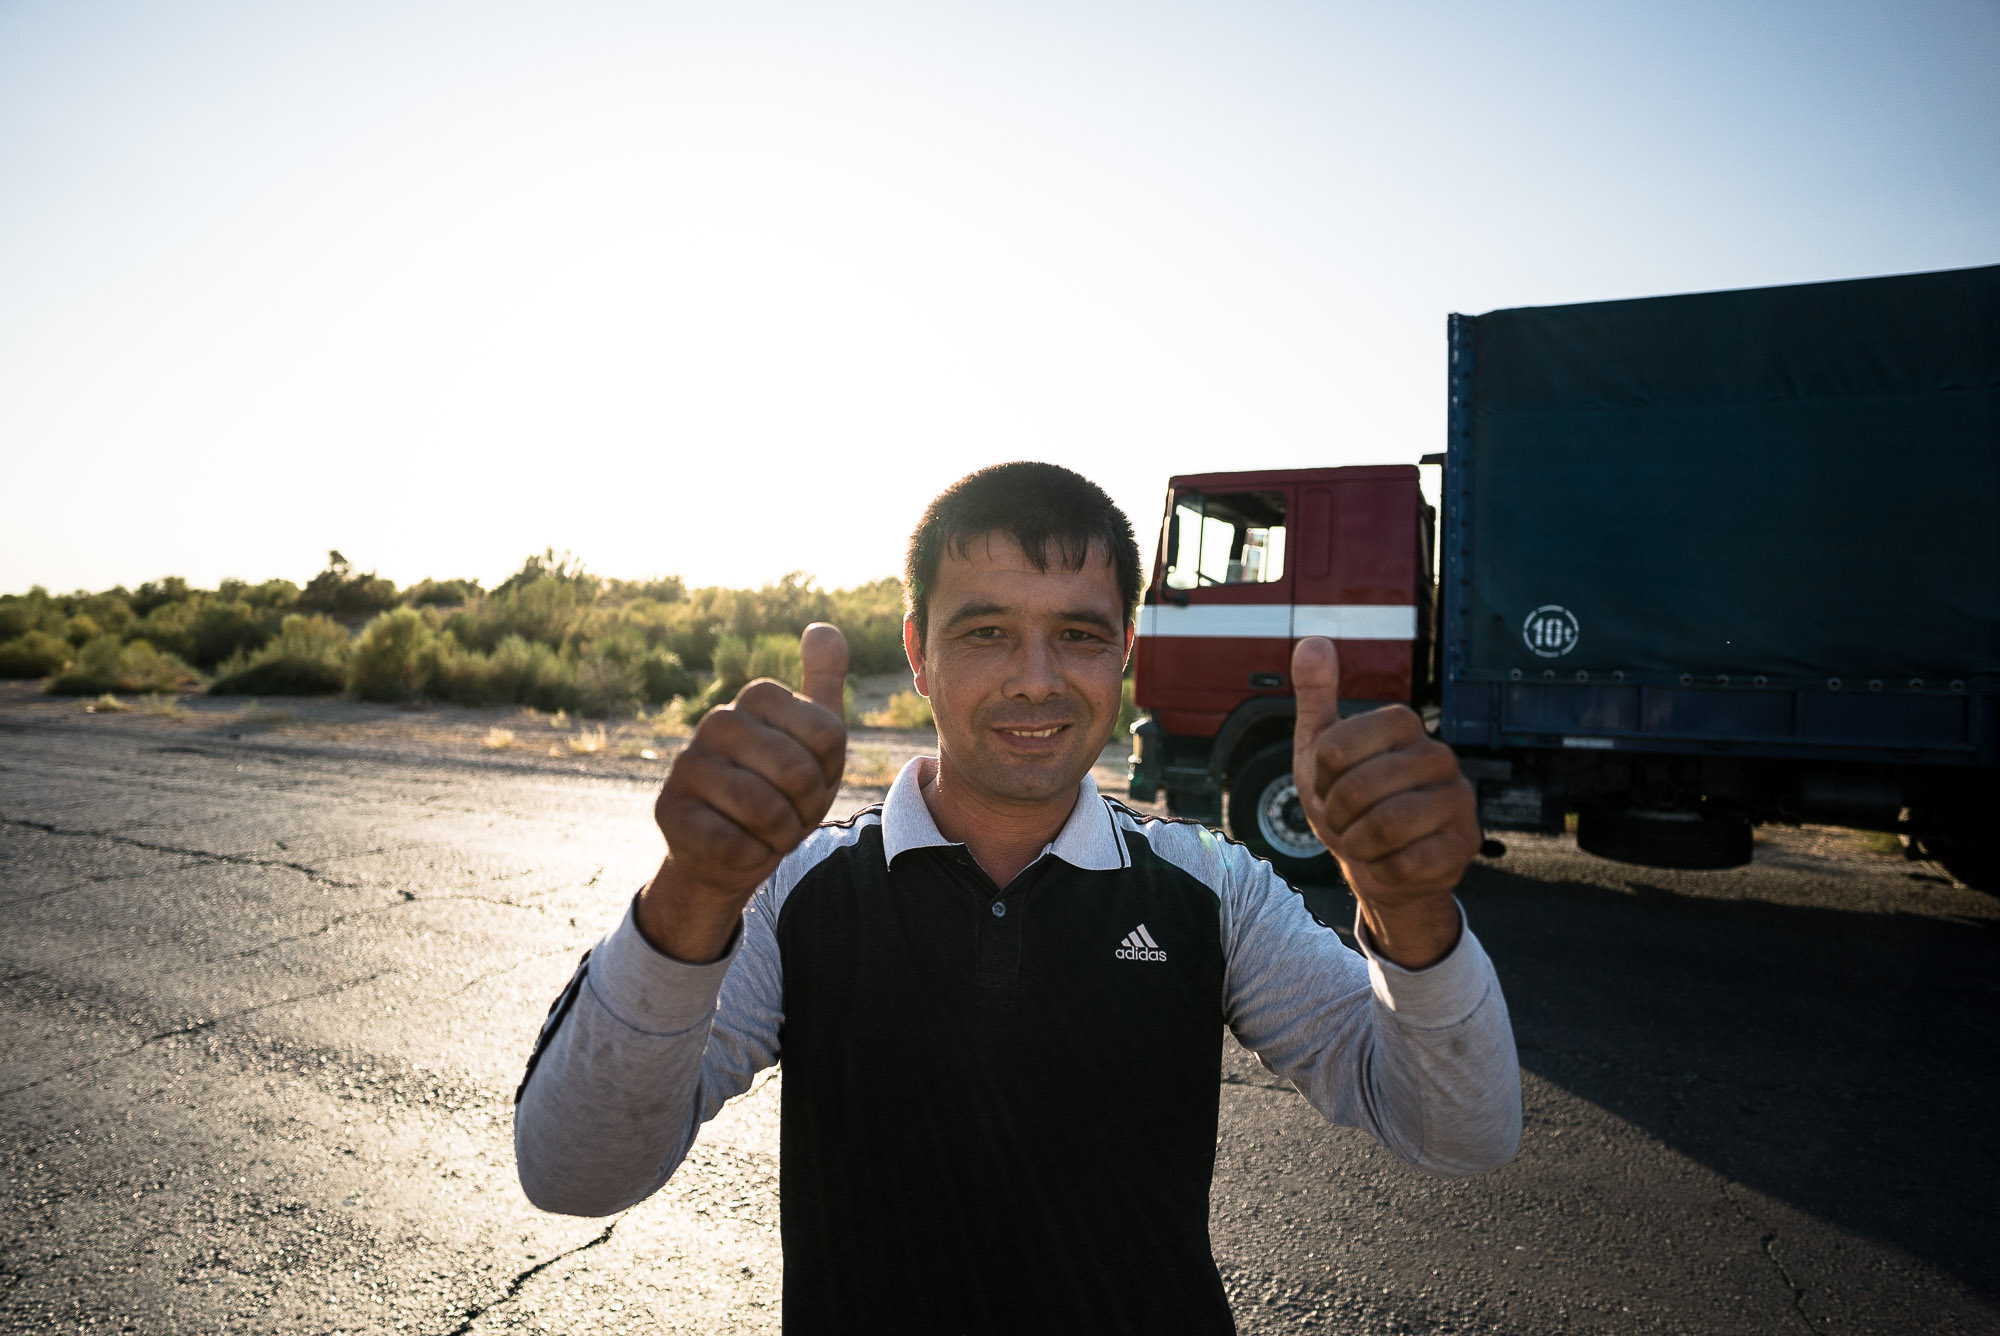 truck driver who speaks German